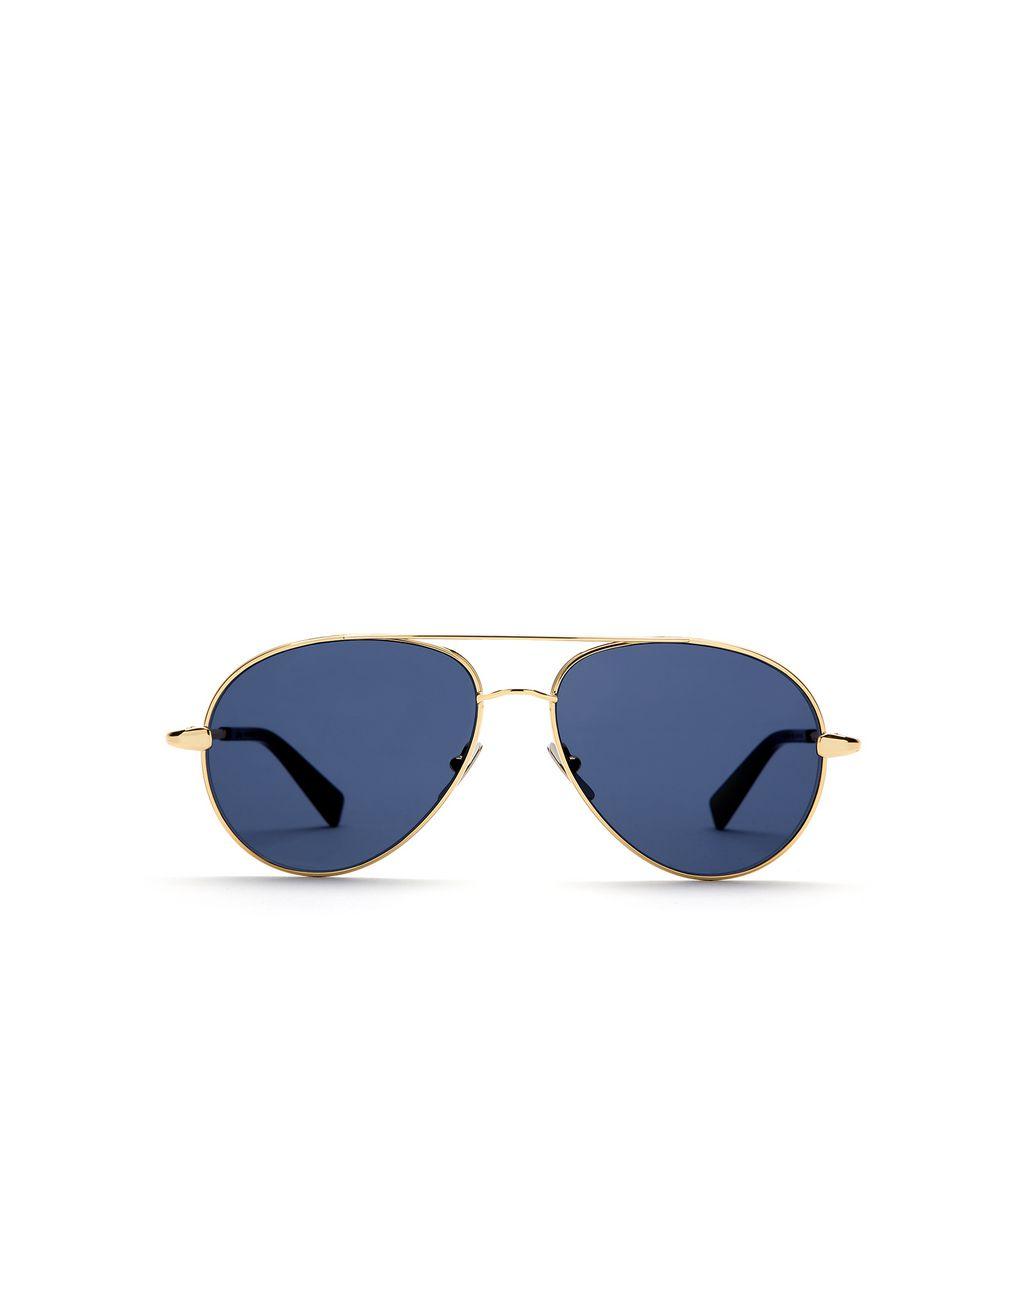 BRIONI Gold Aviator Sunglasses with Blue Lenses Sunglasses       pickupInStoreShippingNotGuaranteed info     51ccefc8433